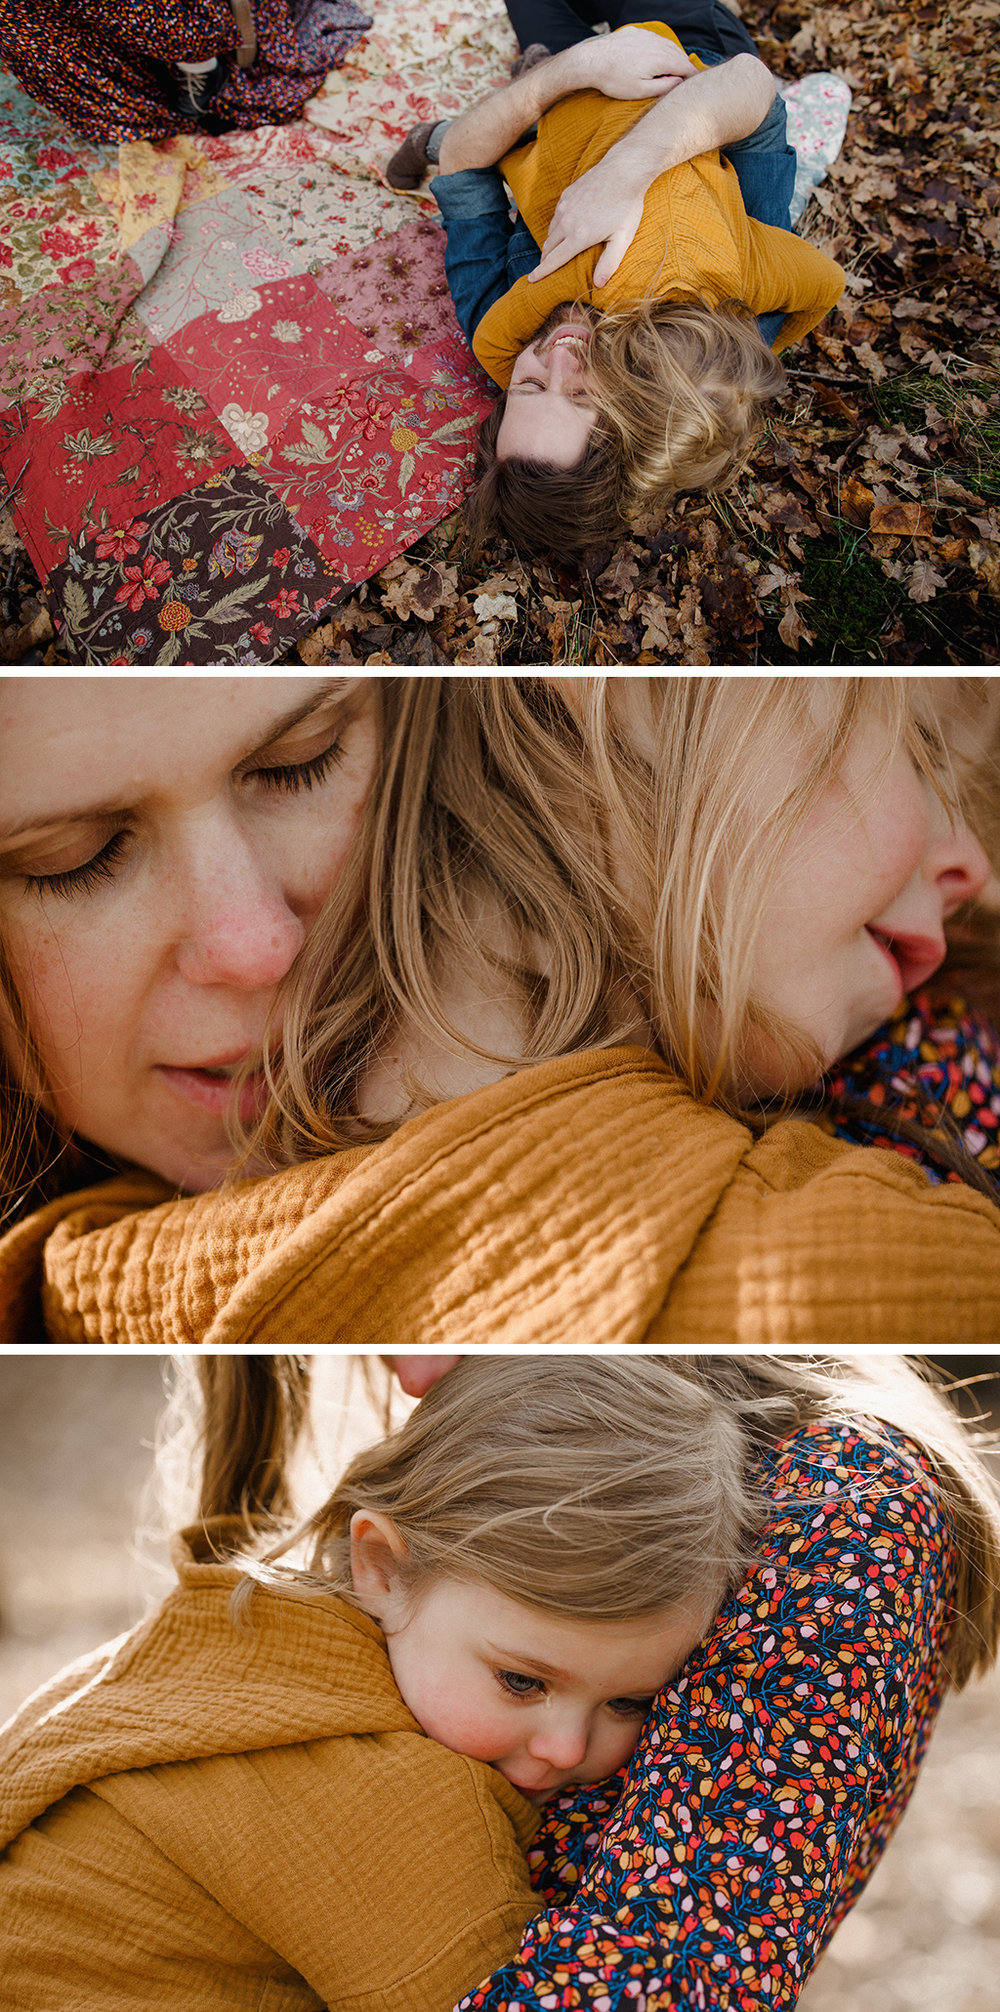 Familjefotograf_Stockholm_Anna-sandstrom_Familjeportratt_Fine-Art-5.jpg